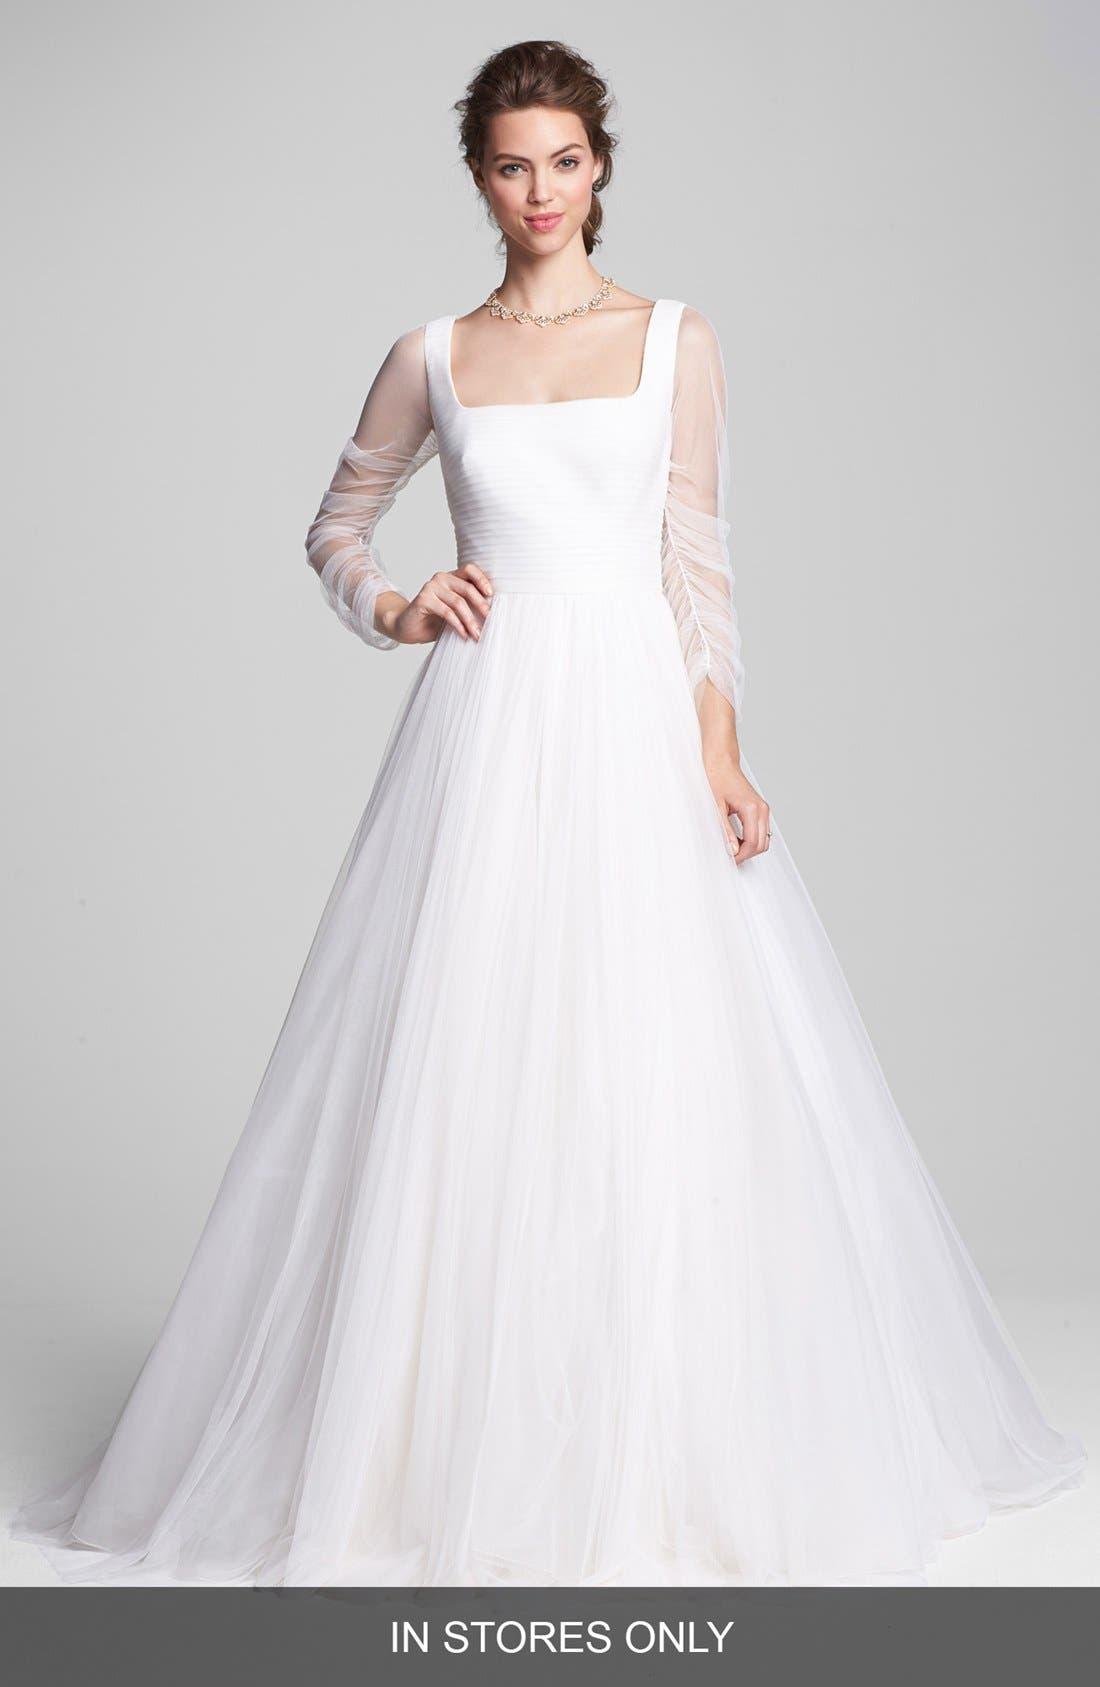 Alternate Image 1 Selected - Rosa Clara 'Belinda' Full Skirt Chiffon Dress (In Stores Only)